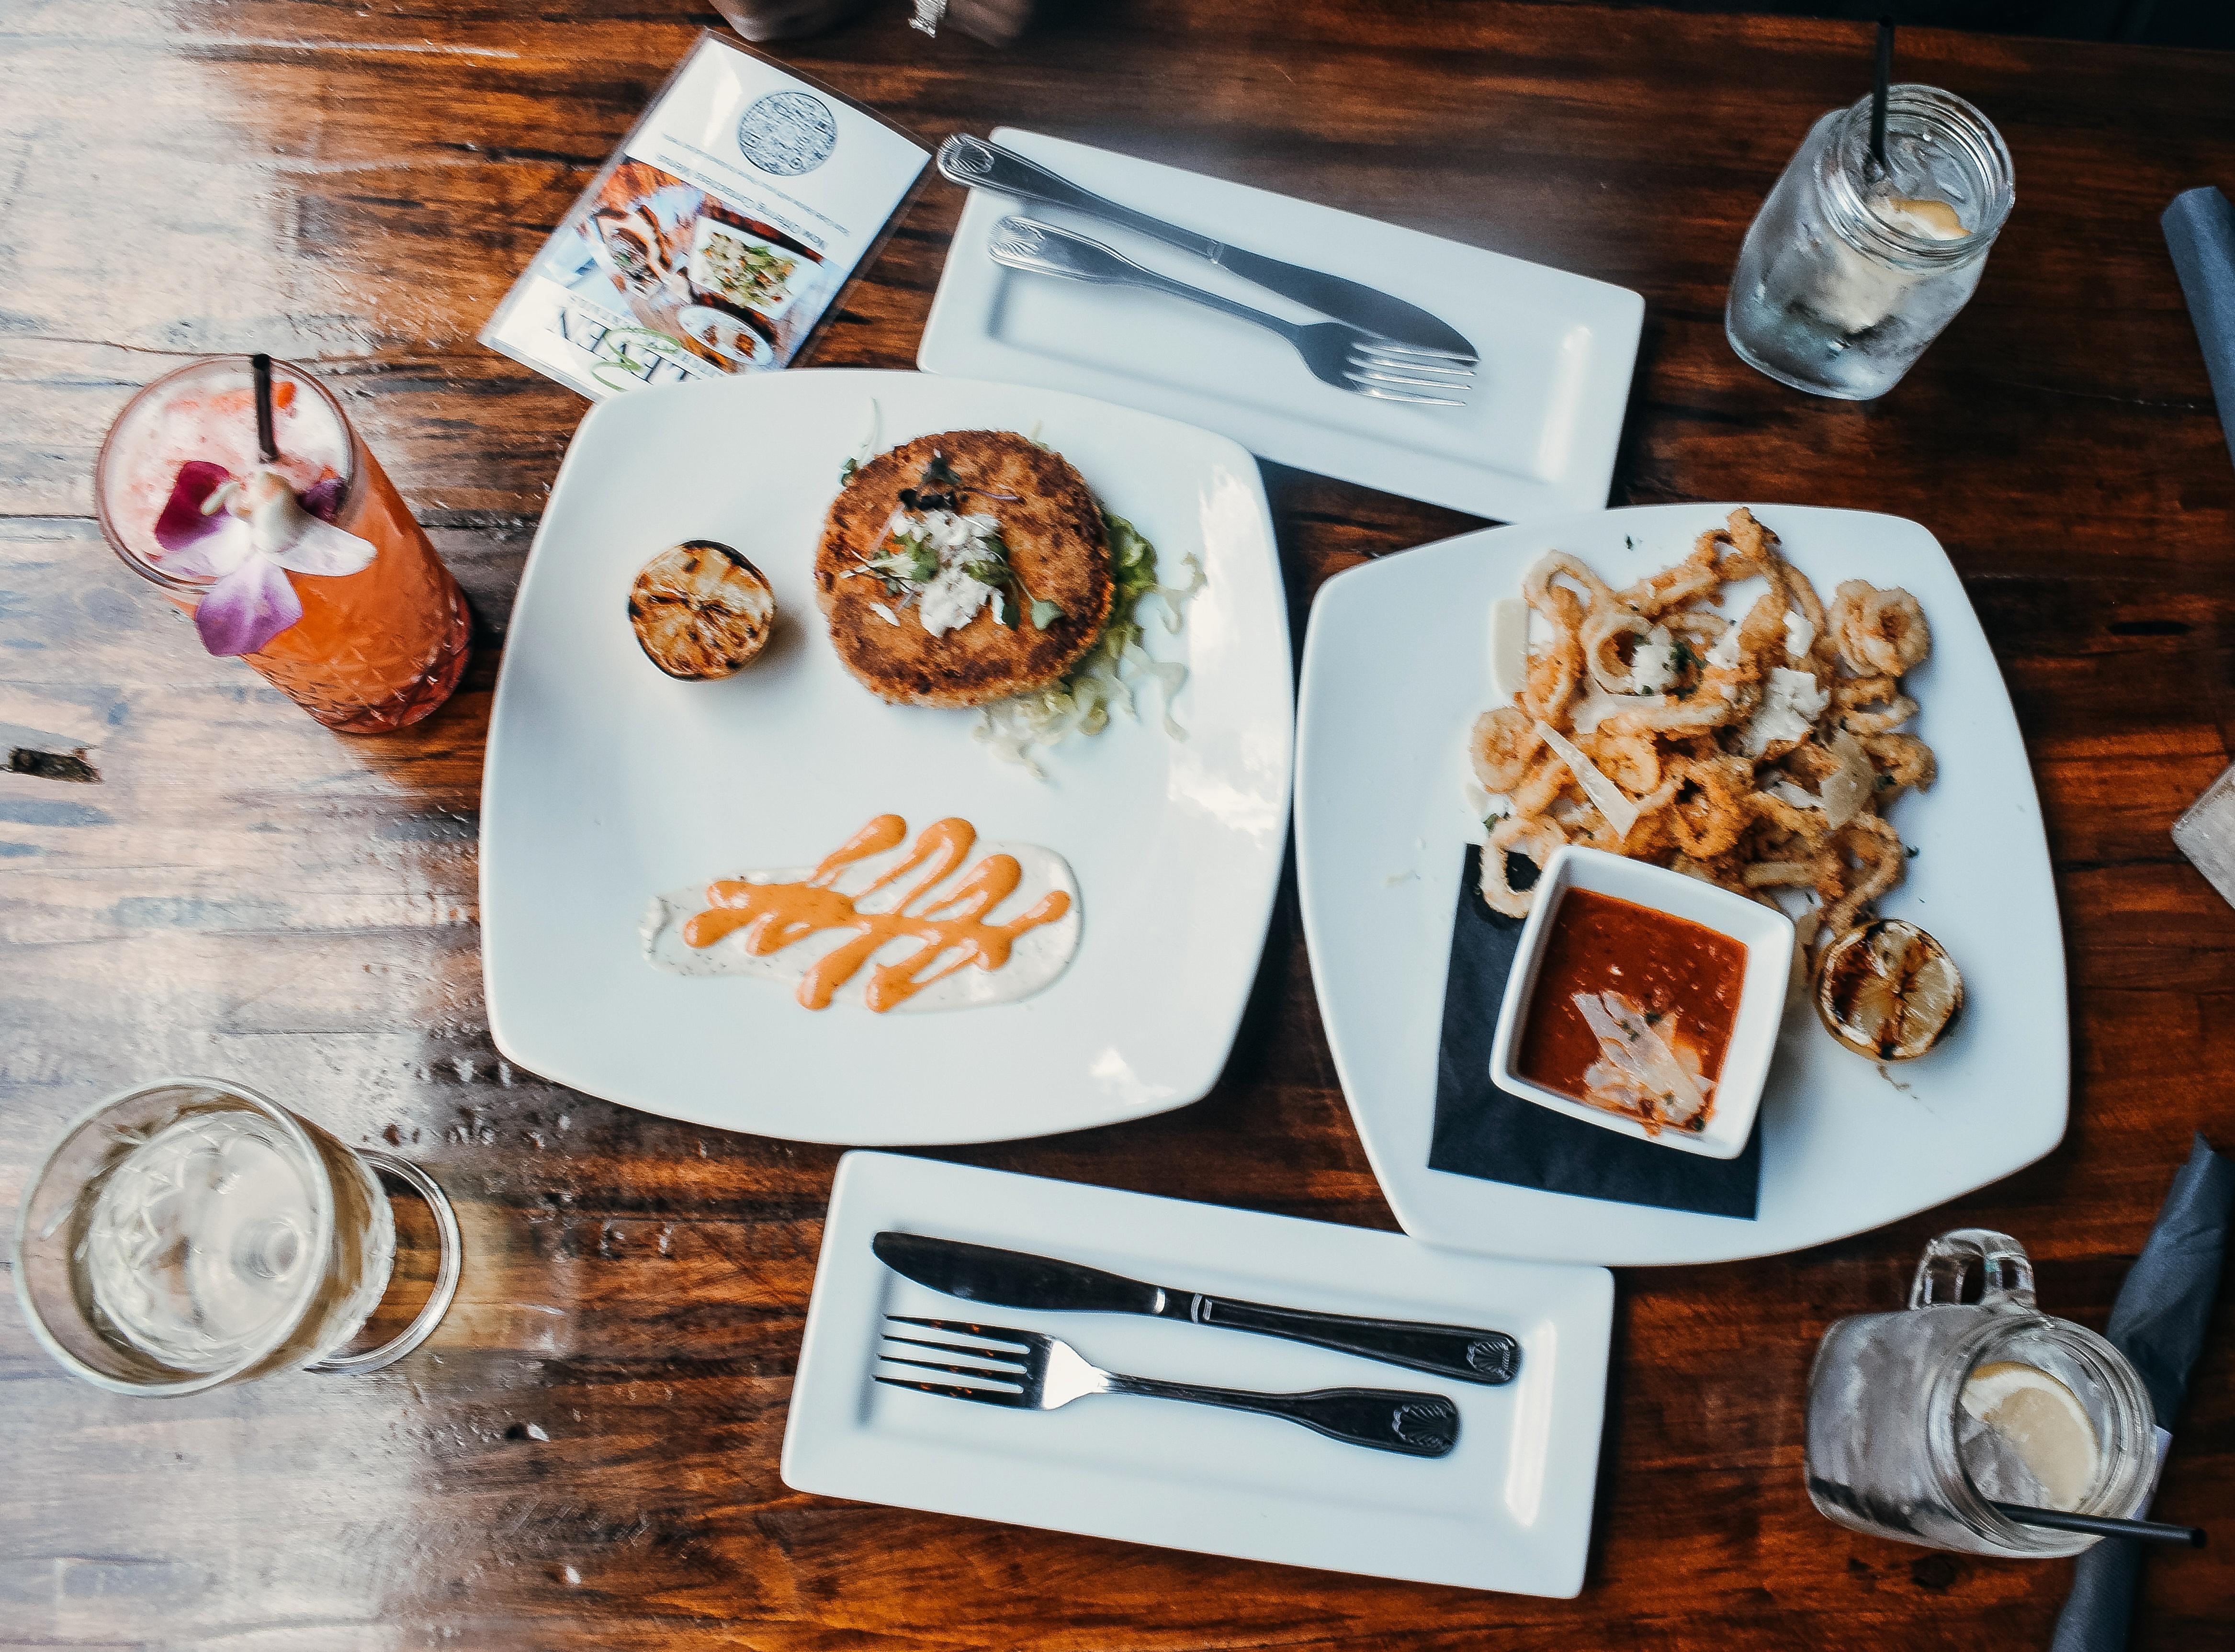 3 eleven restaurant menu appetizers